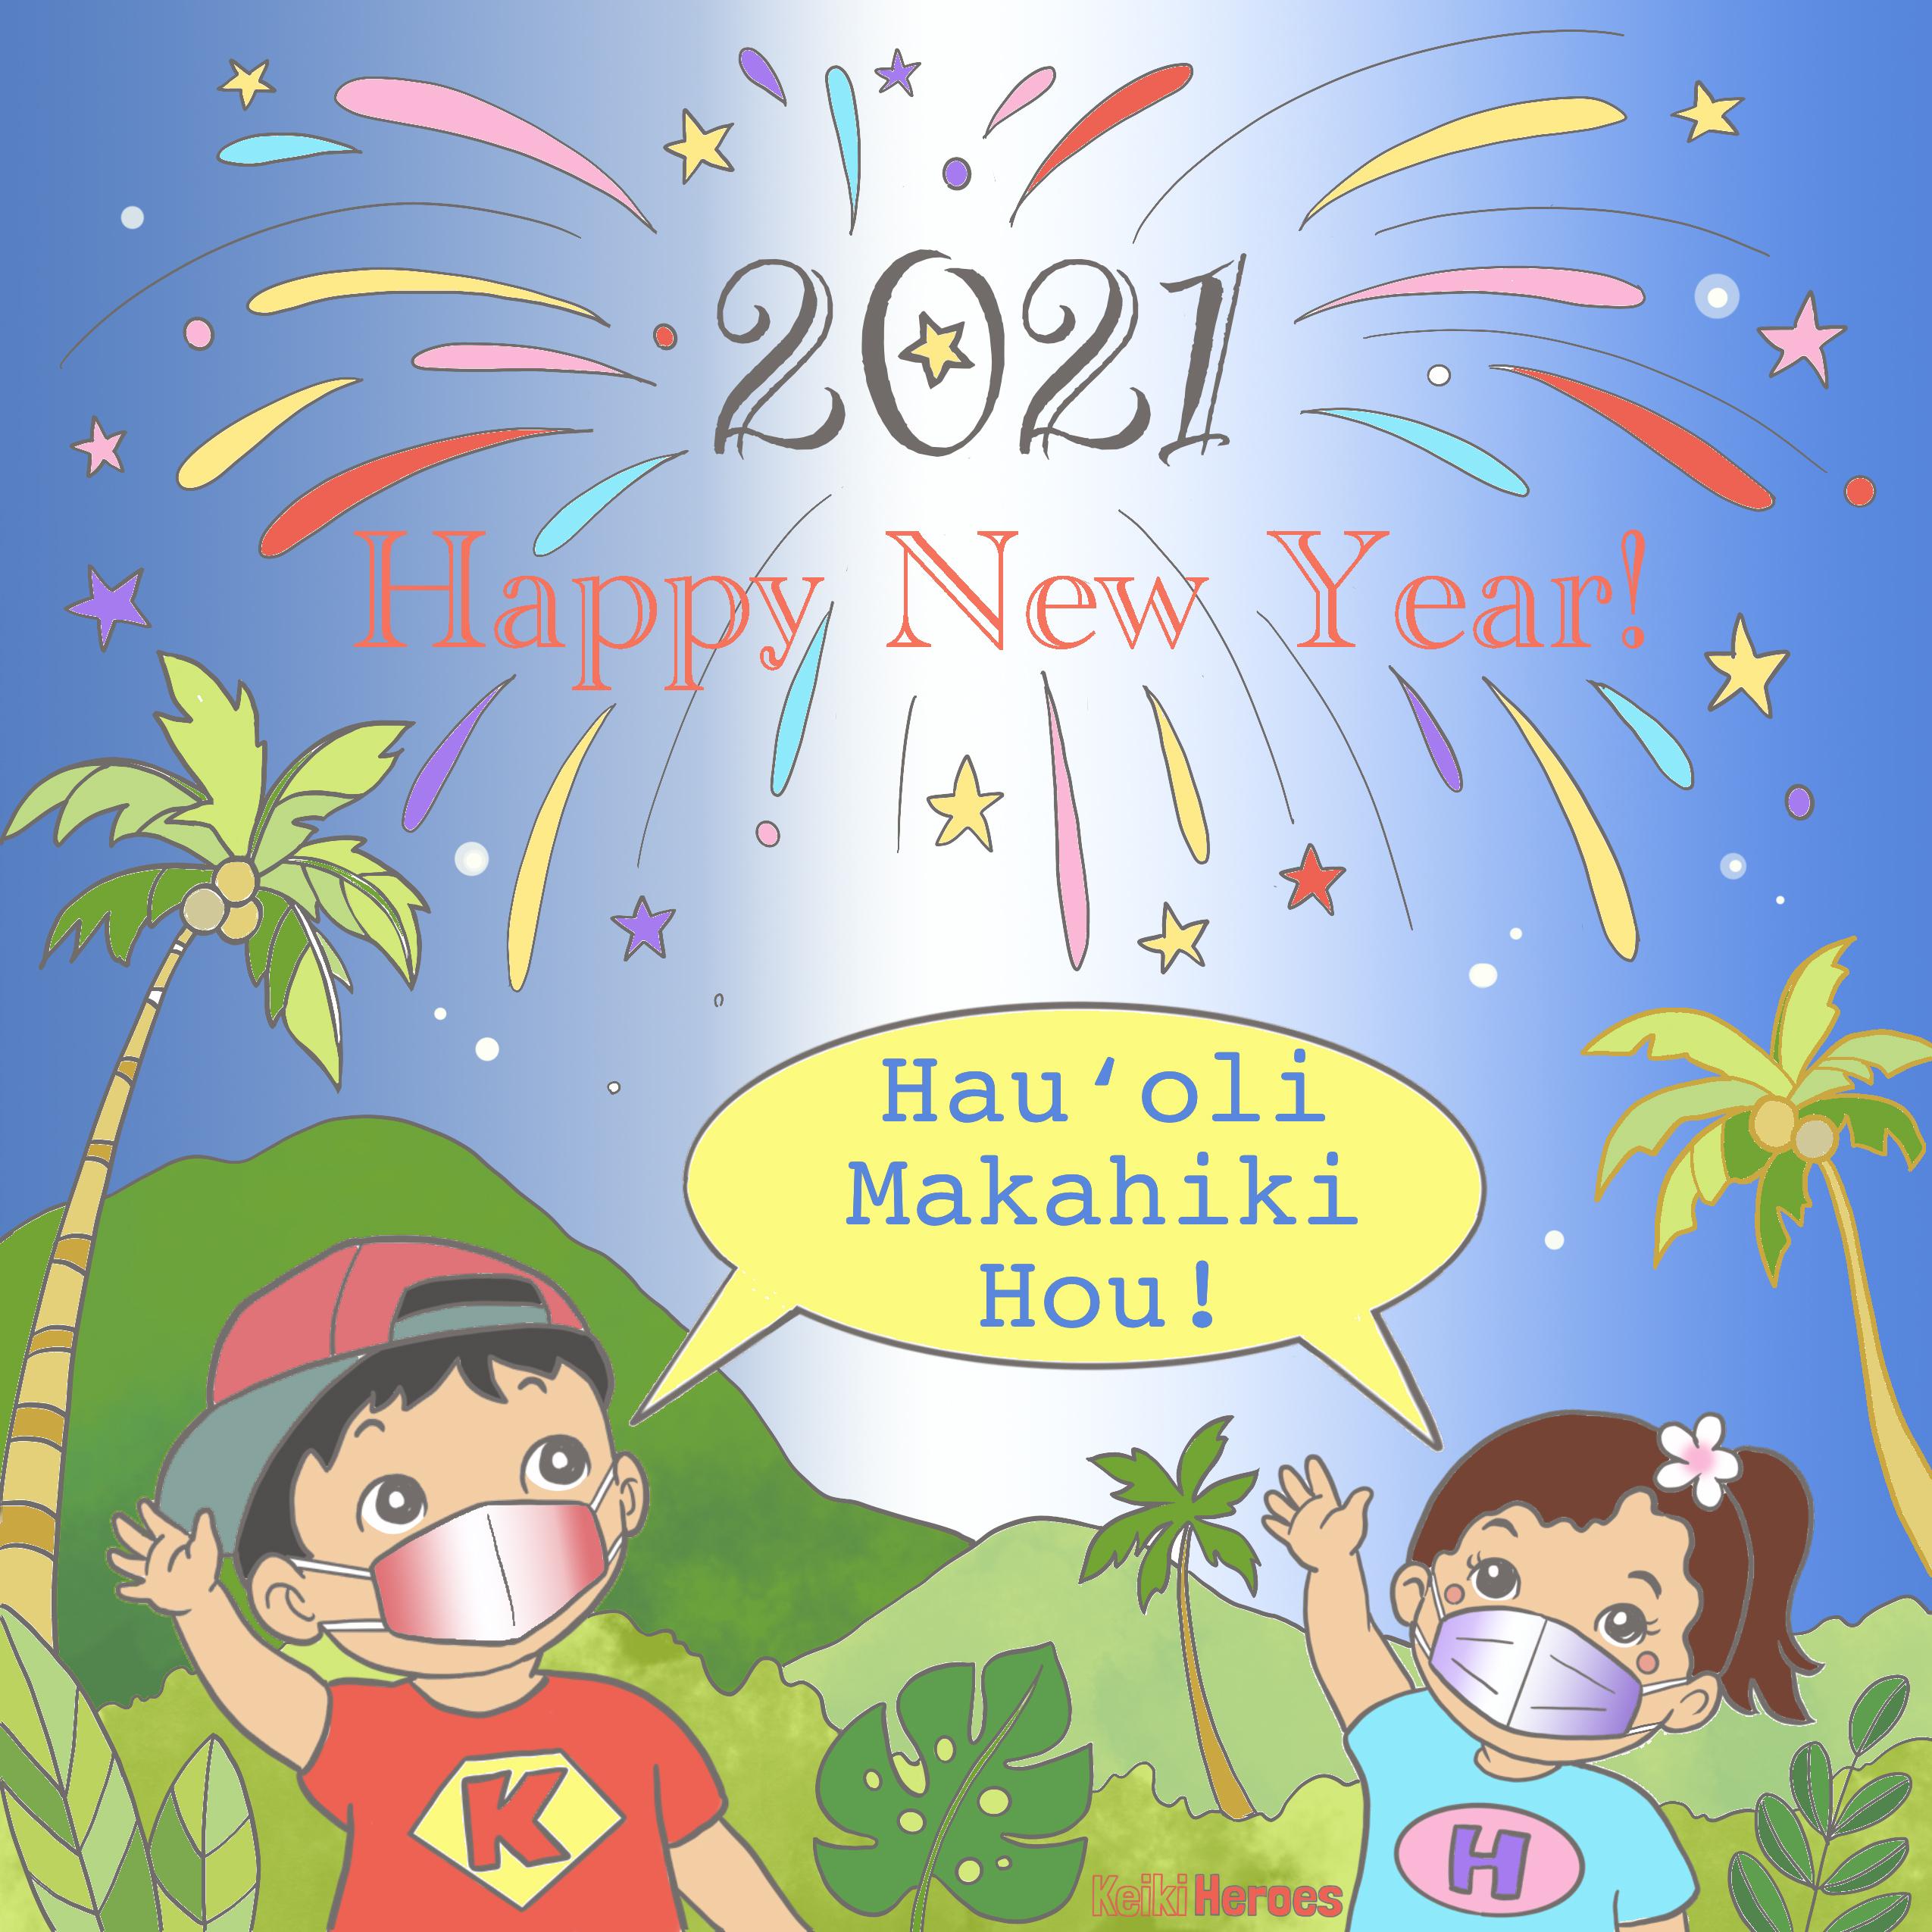 Hauo Li Makahiki Hou! – Happy New Year Coloring Sheet & Flyer